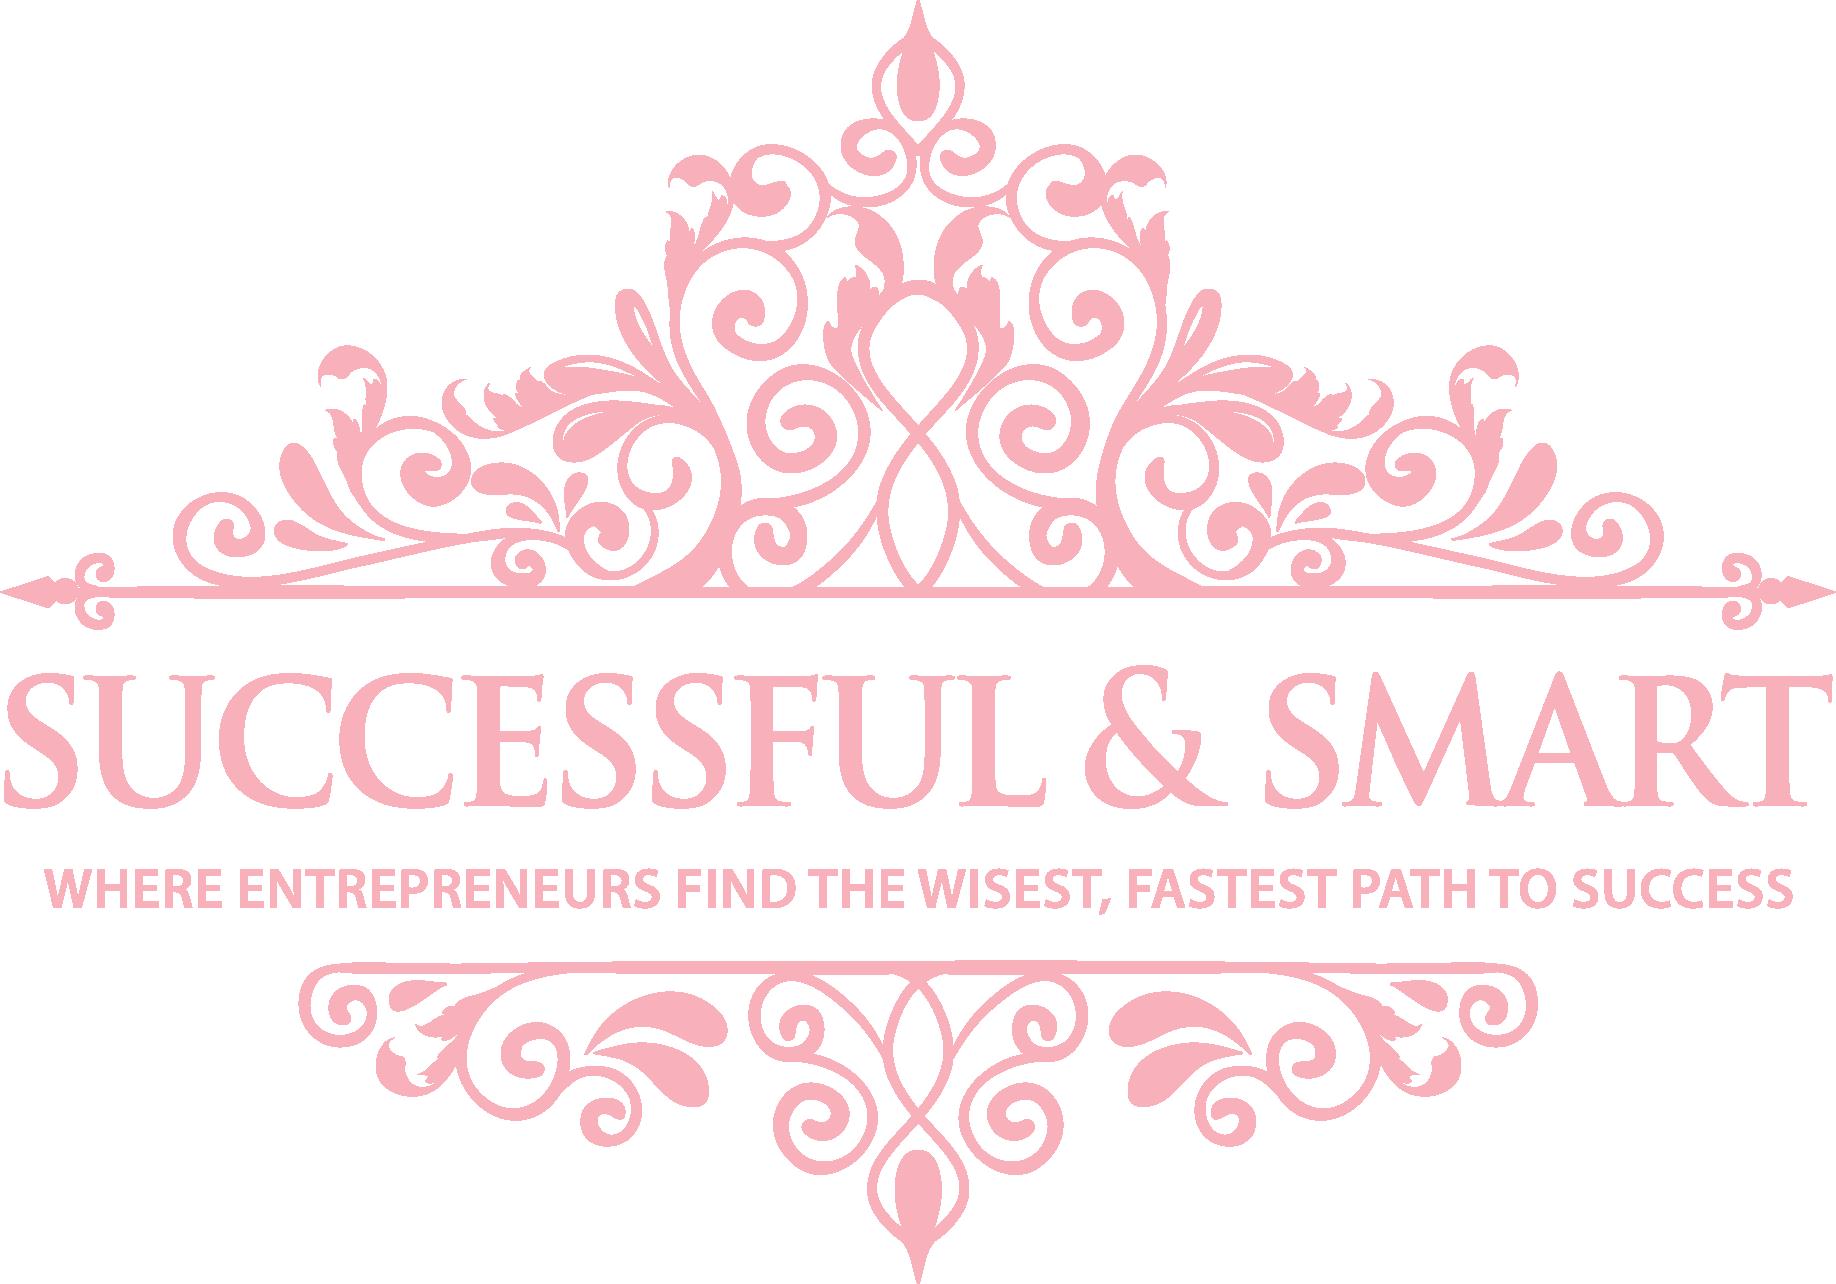 Successful & Smart Business Coaching